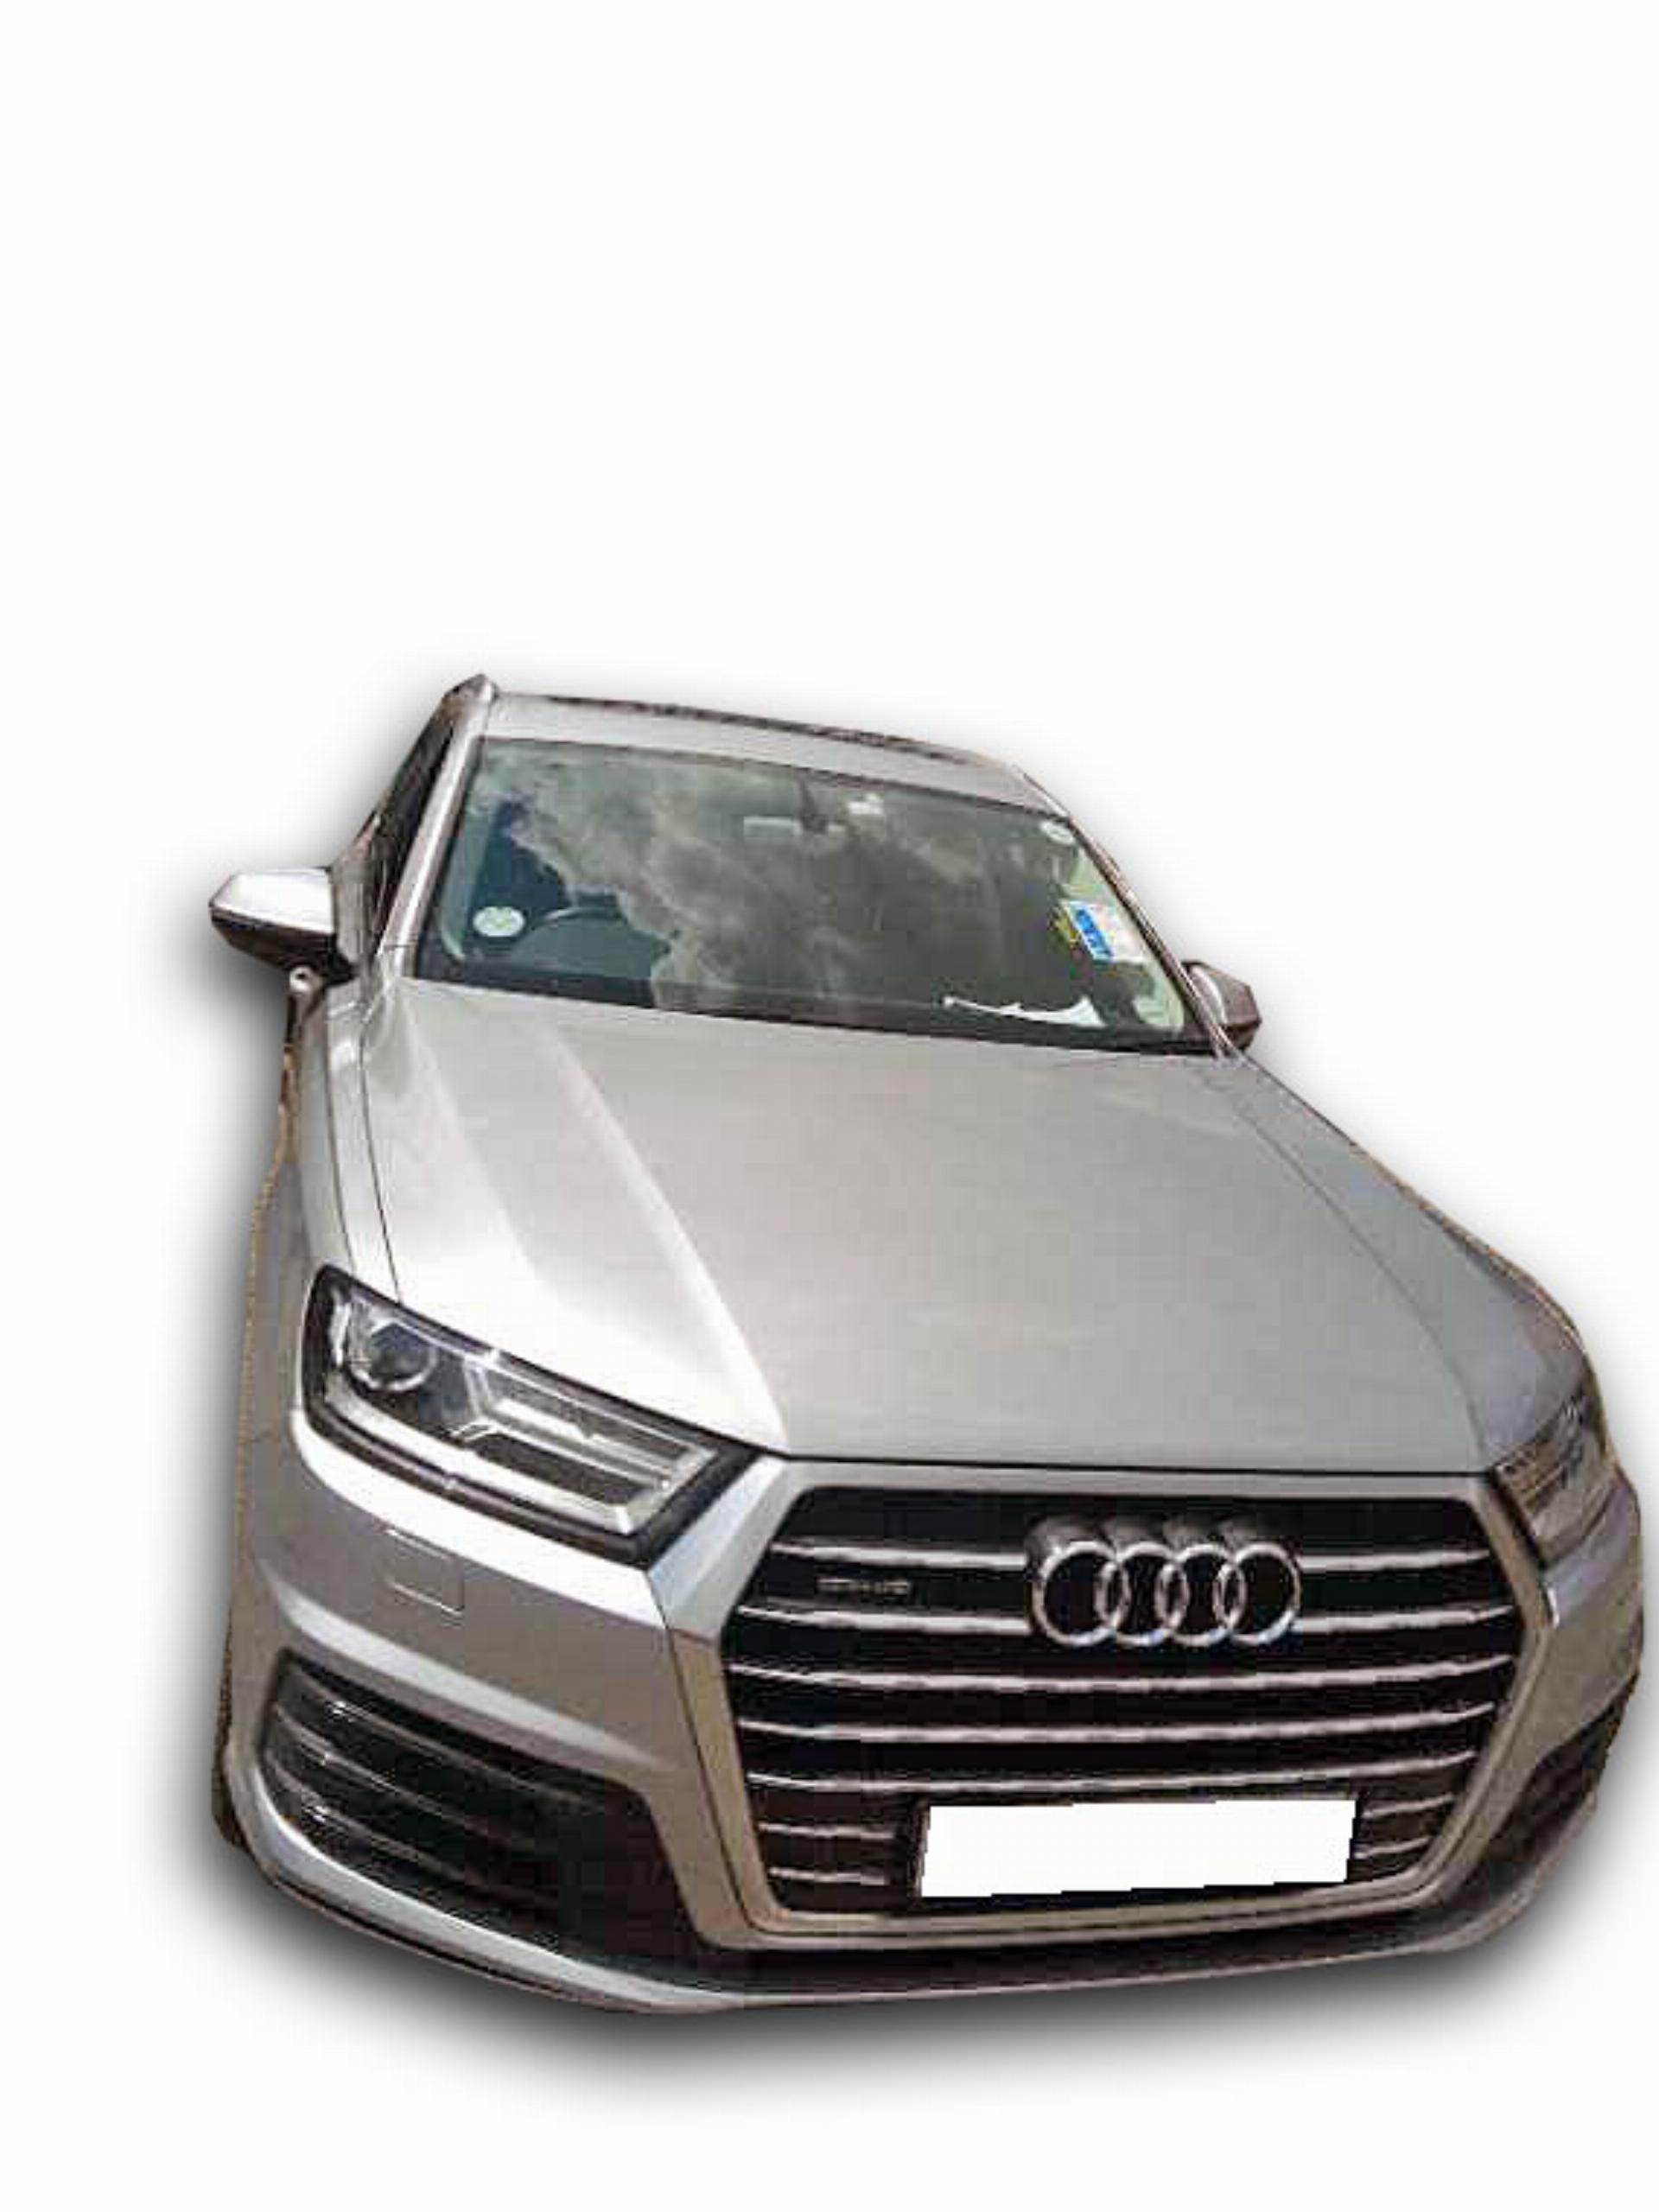 Audi AU 716 - Q7